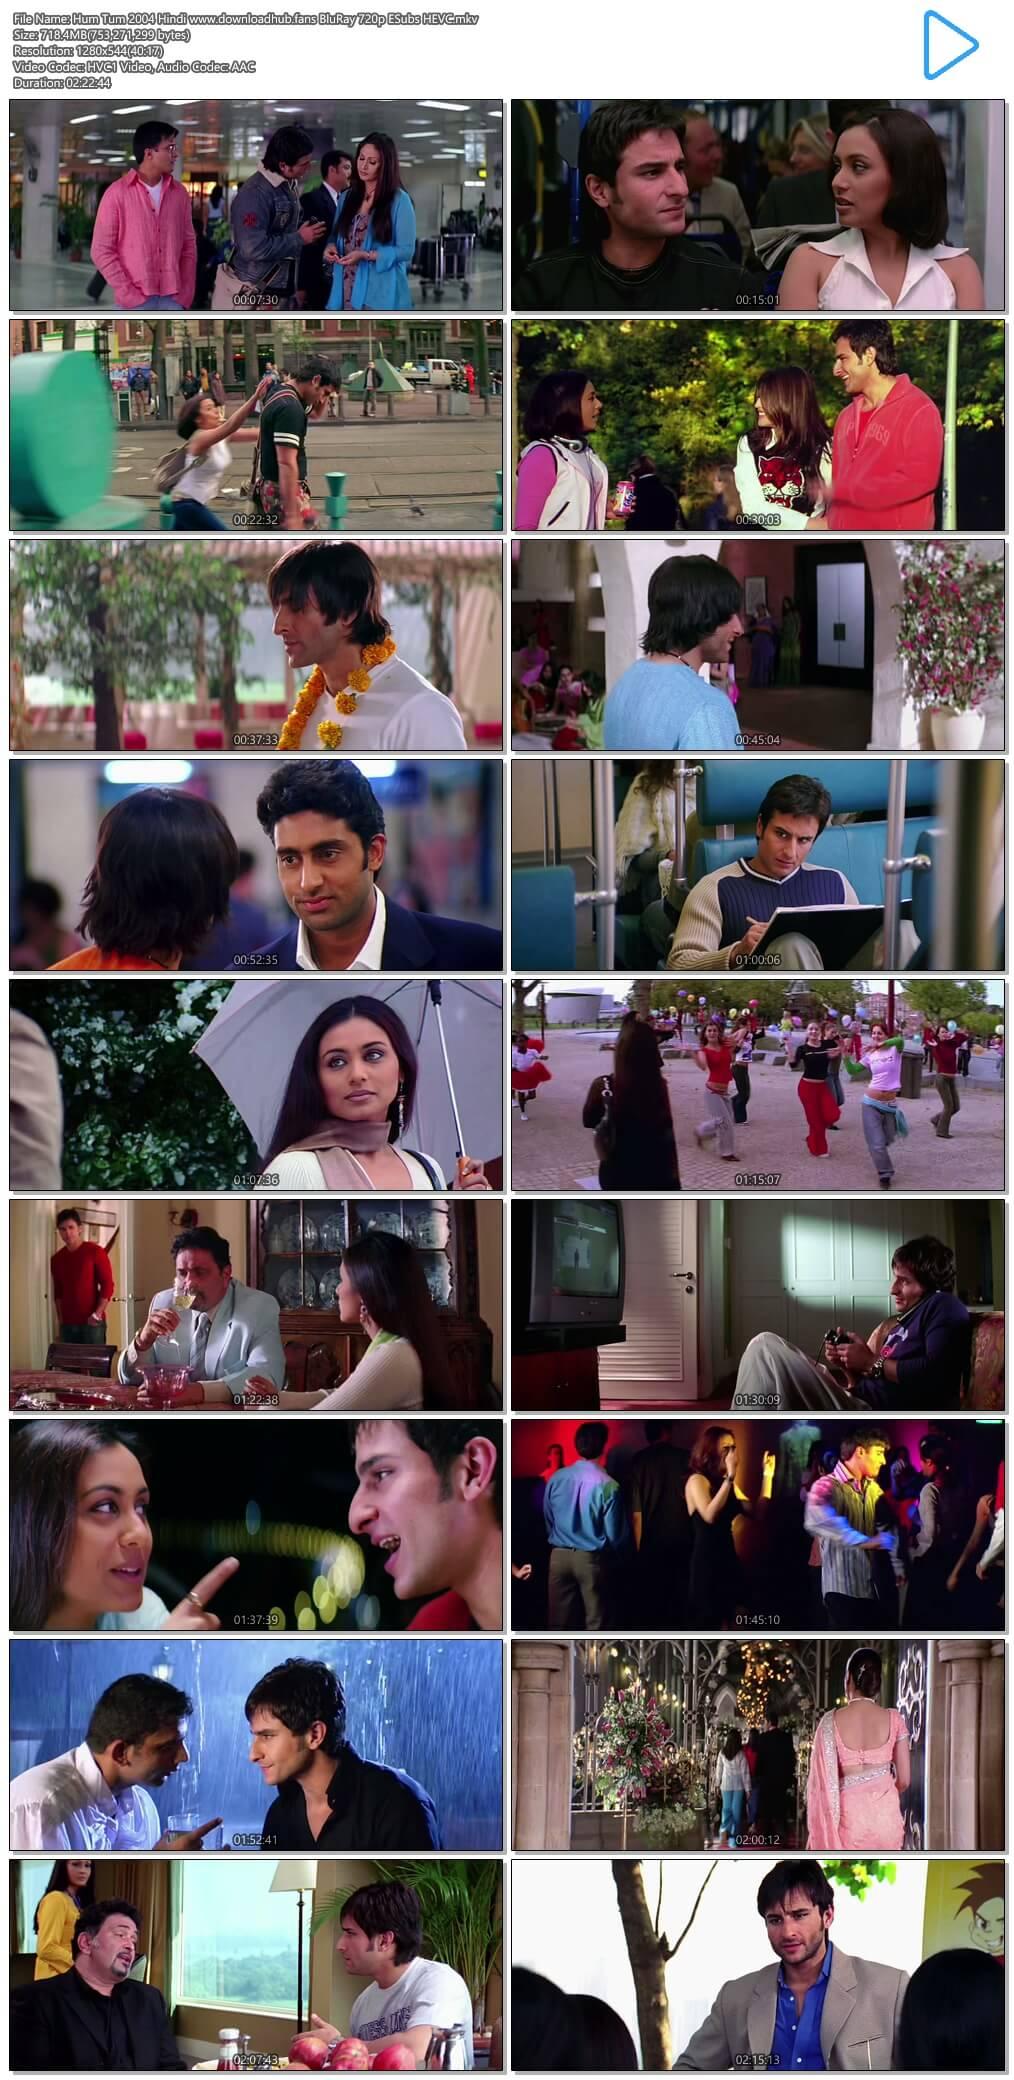 Hum Tum 2004 Hindi 700MB BluRay 720p ESubs HEVC